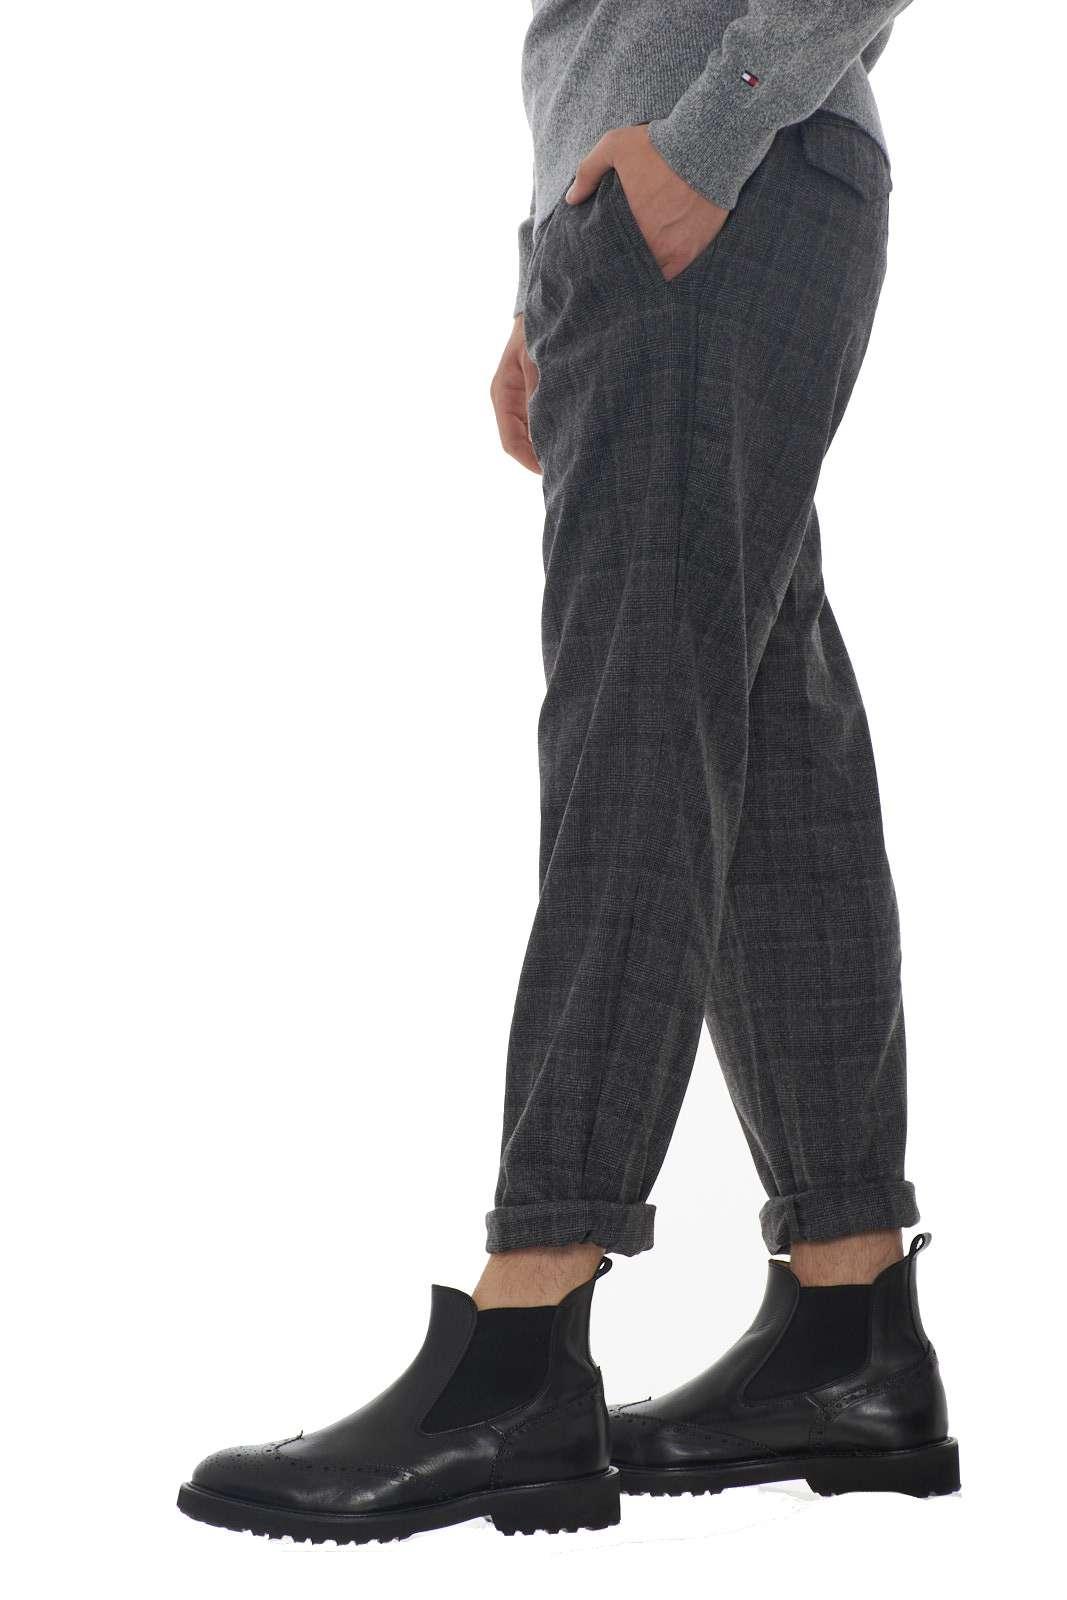 https://www.parmax.com/media/catalog/product/a/i/AI-outlet_parmax-pantaloni-uomo-Micheal%20Coal-carl3305-C.jpg